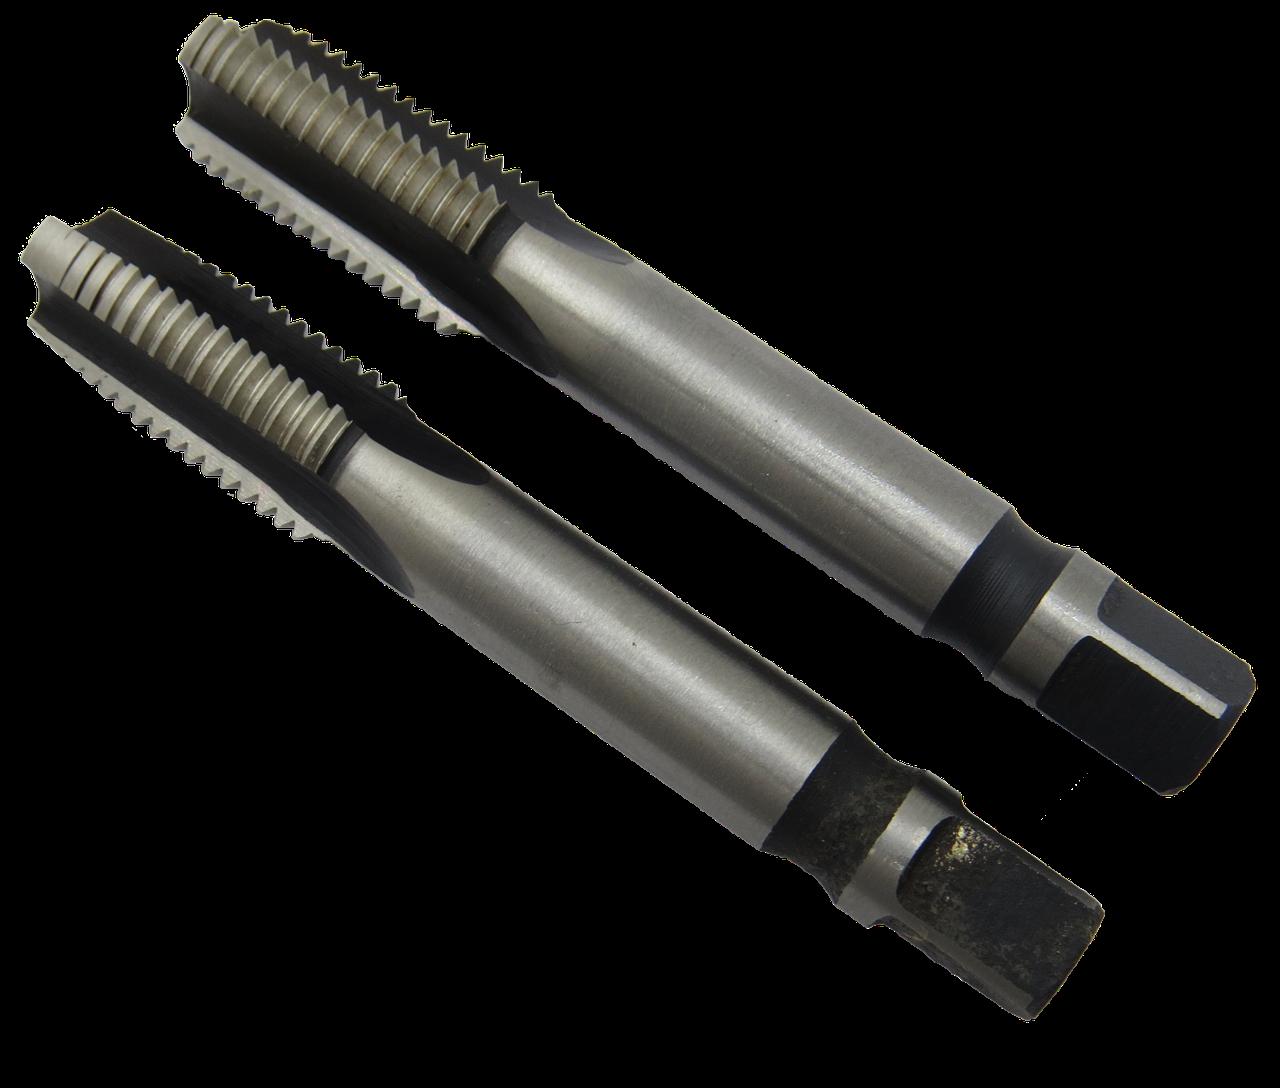 Метчик машинно-ручной М14х1,25 Р6М5 комплект из 2х штук